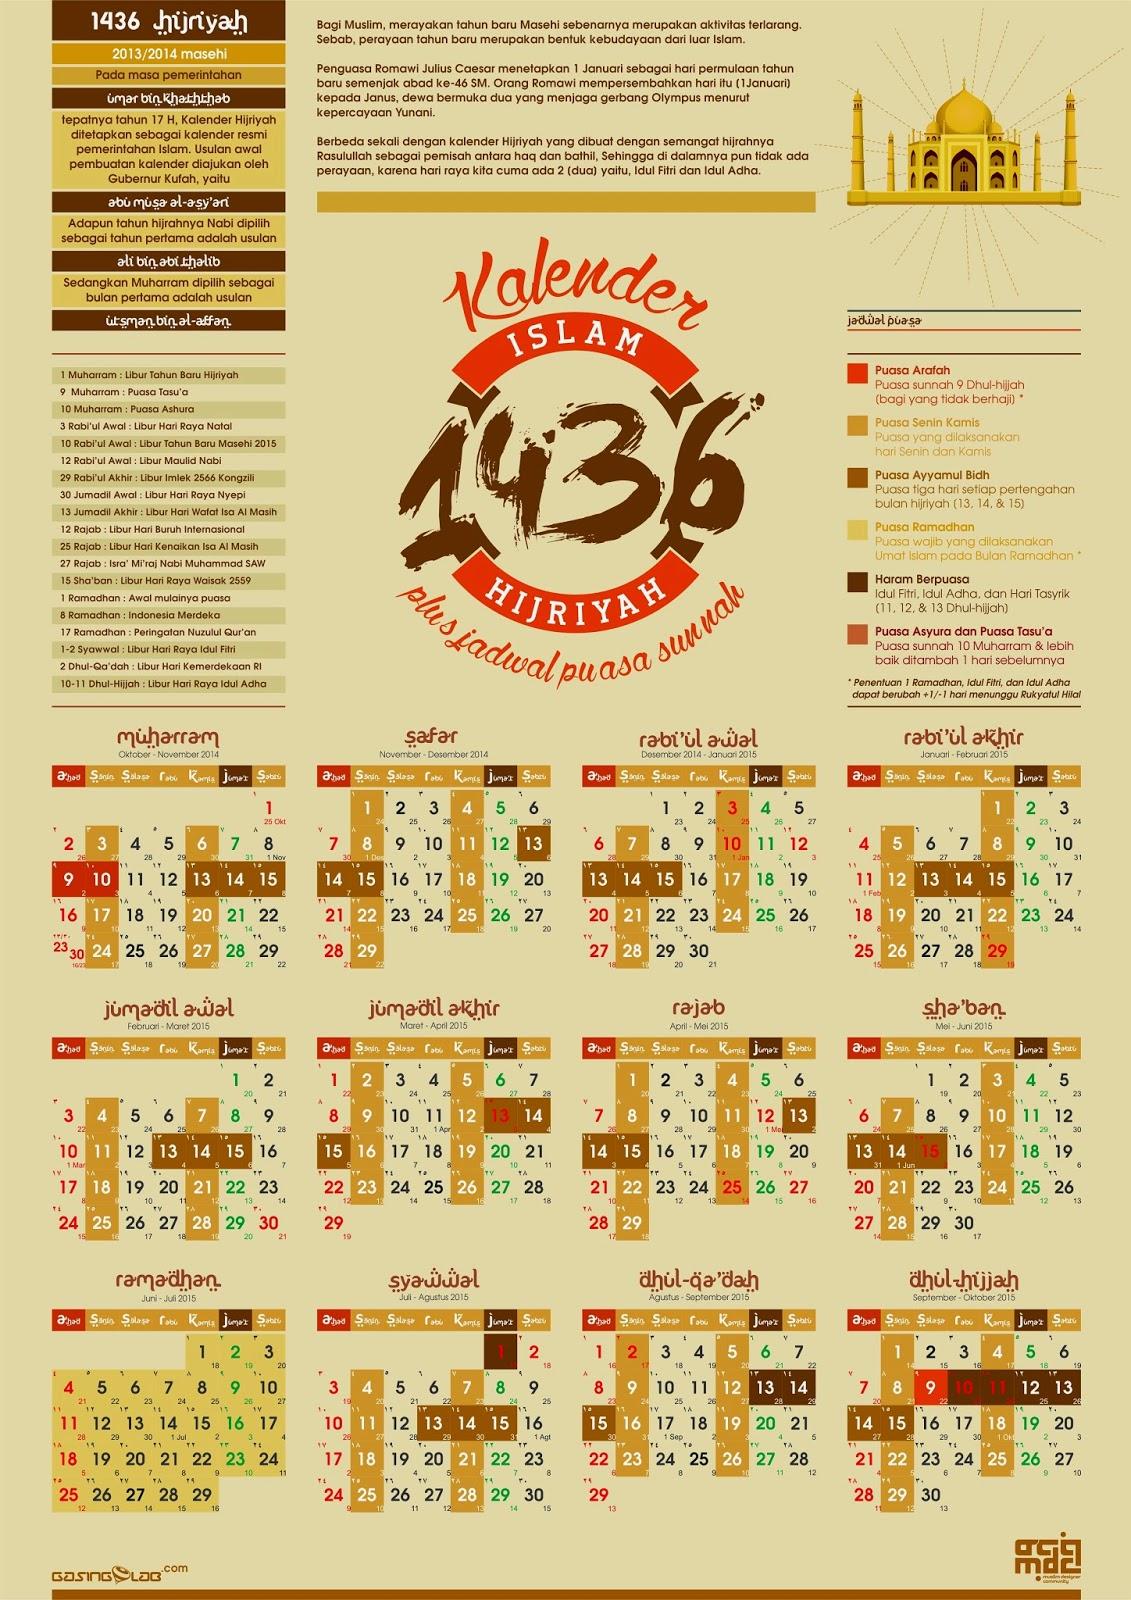 Kalender Islam 2015 Indonesia Bulan Islam | Search Results | Calendar ...